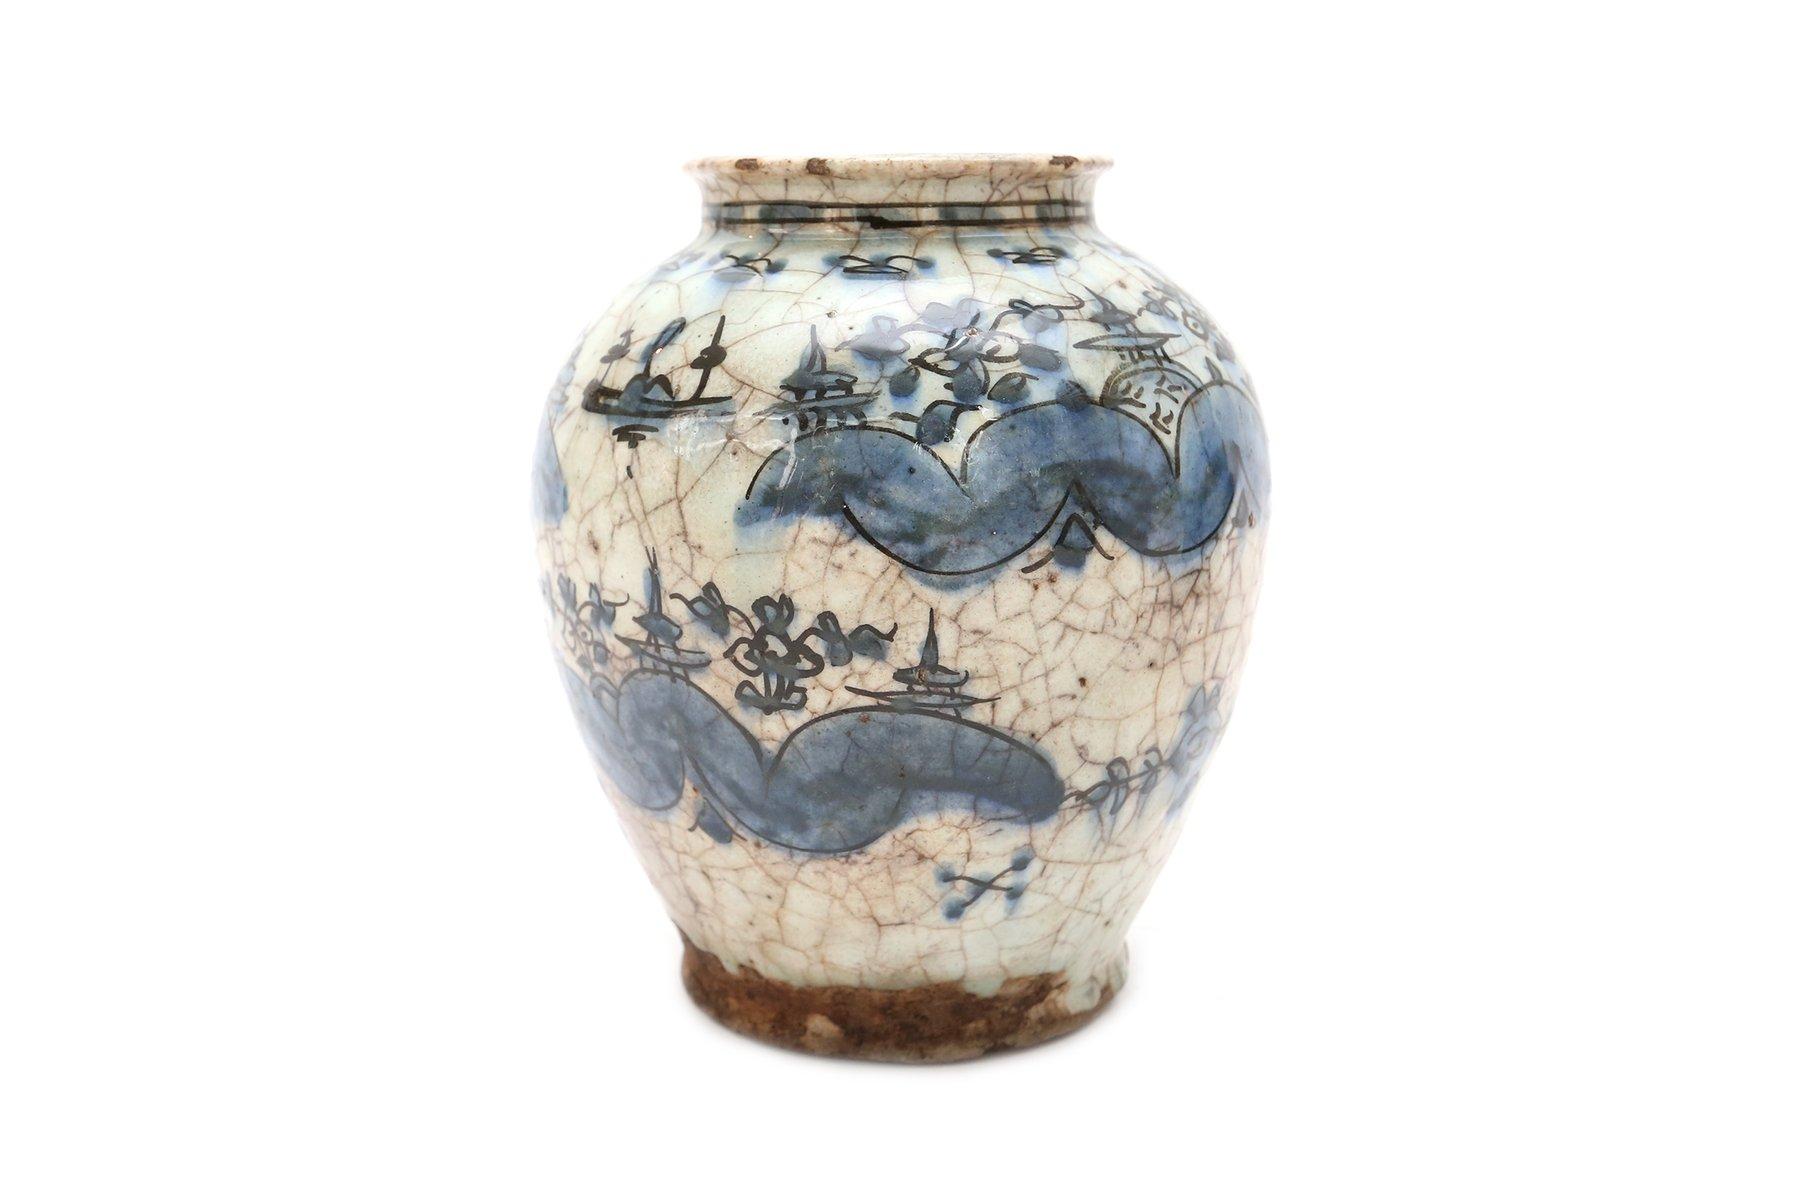 antike keramik vasen im persischen stil 2er set bei. Black Bedroom Furniture Sets. Home Design Ideas